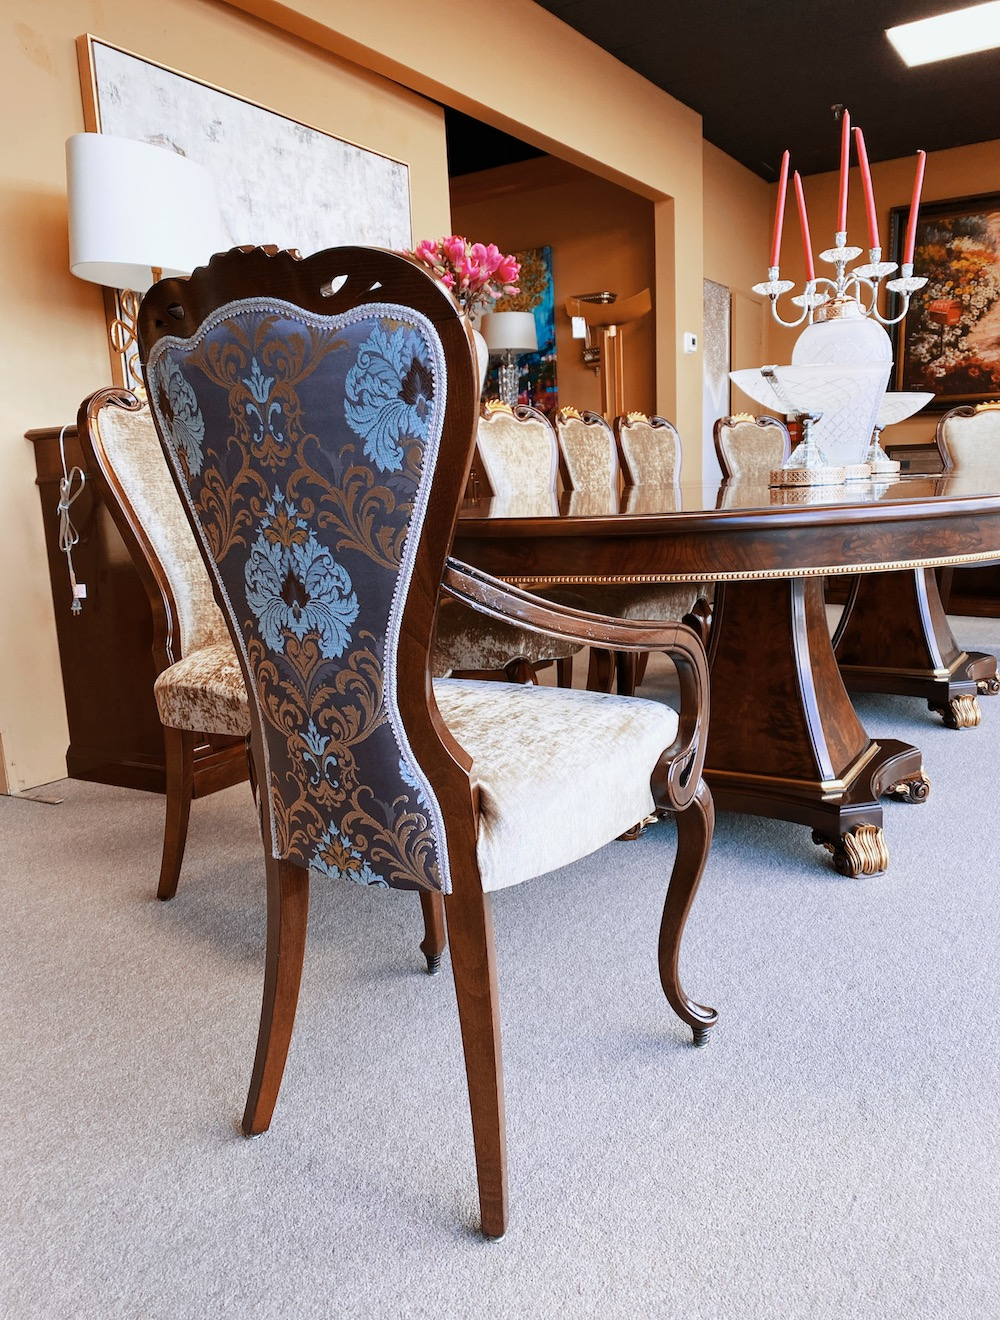 martin daniel interiors classic luxury furniture made in italy 1